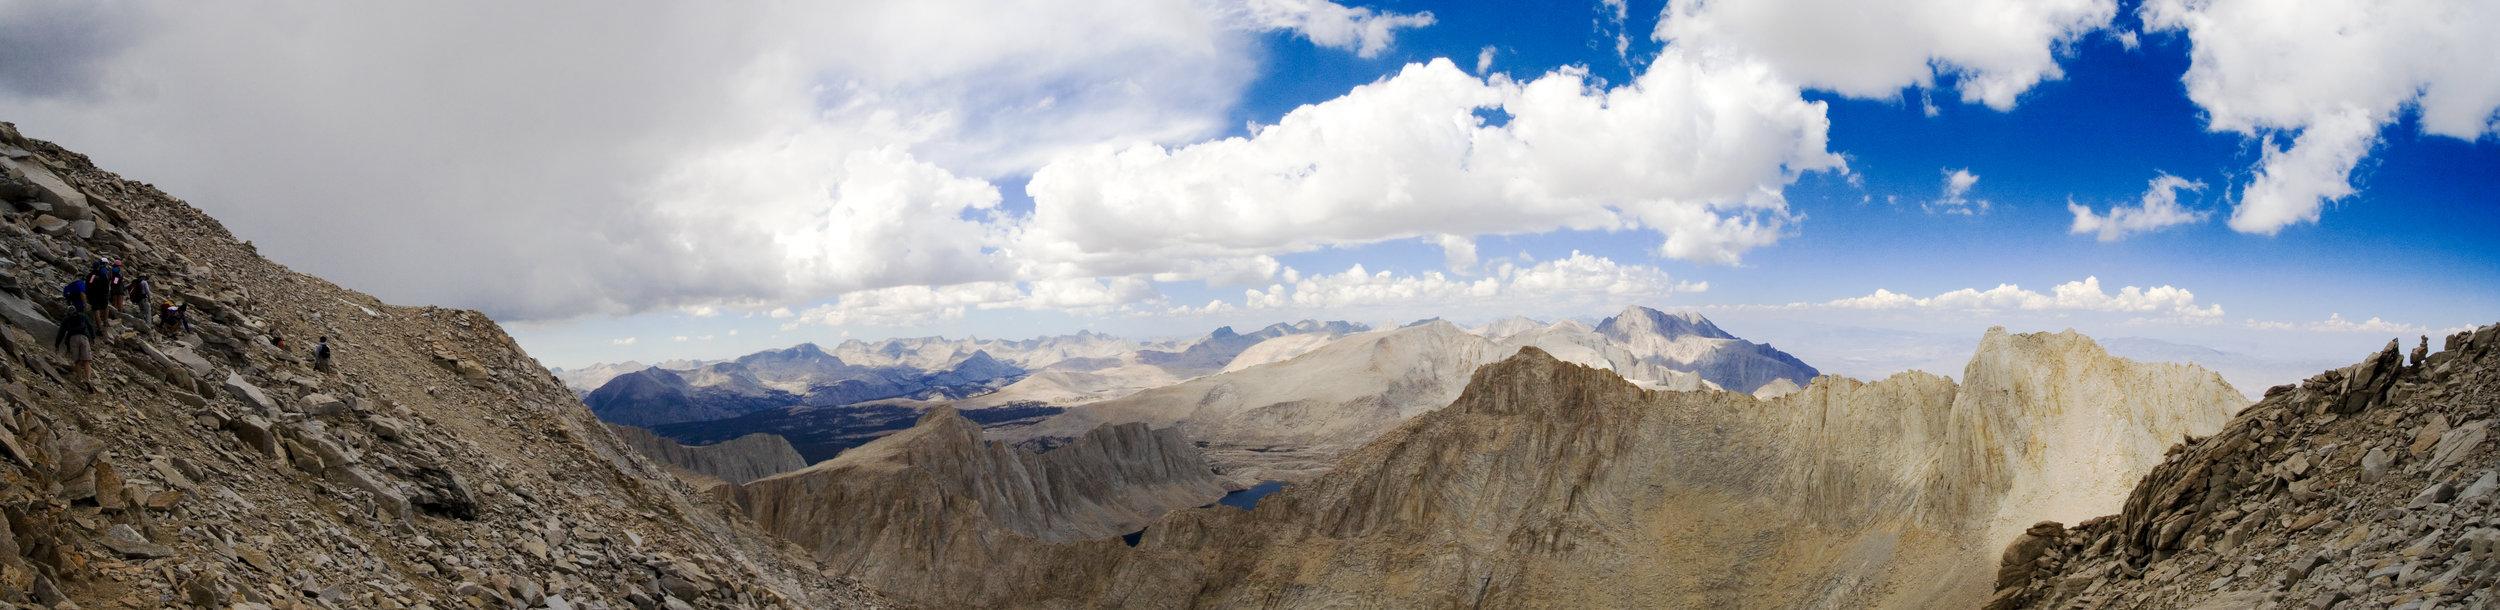 chrissihernandez-california-mount-whitney-hike (5)copy.jpg